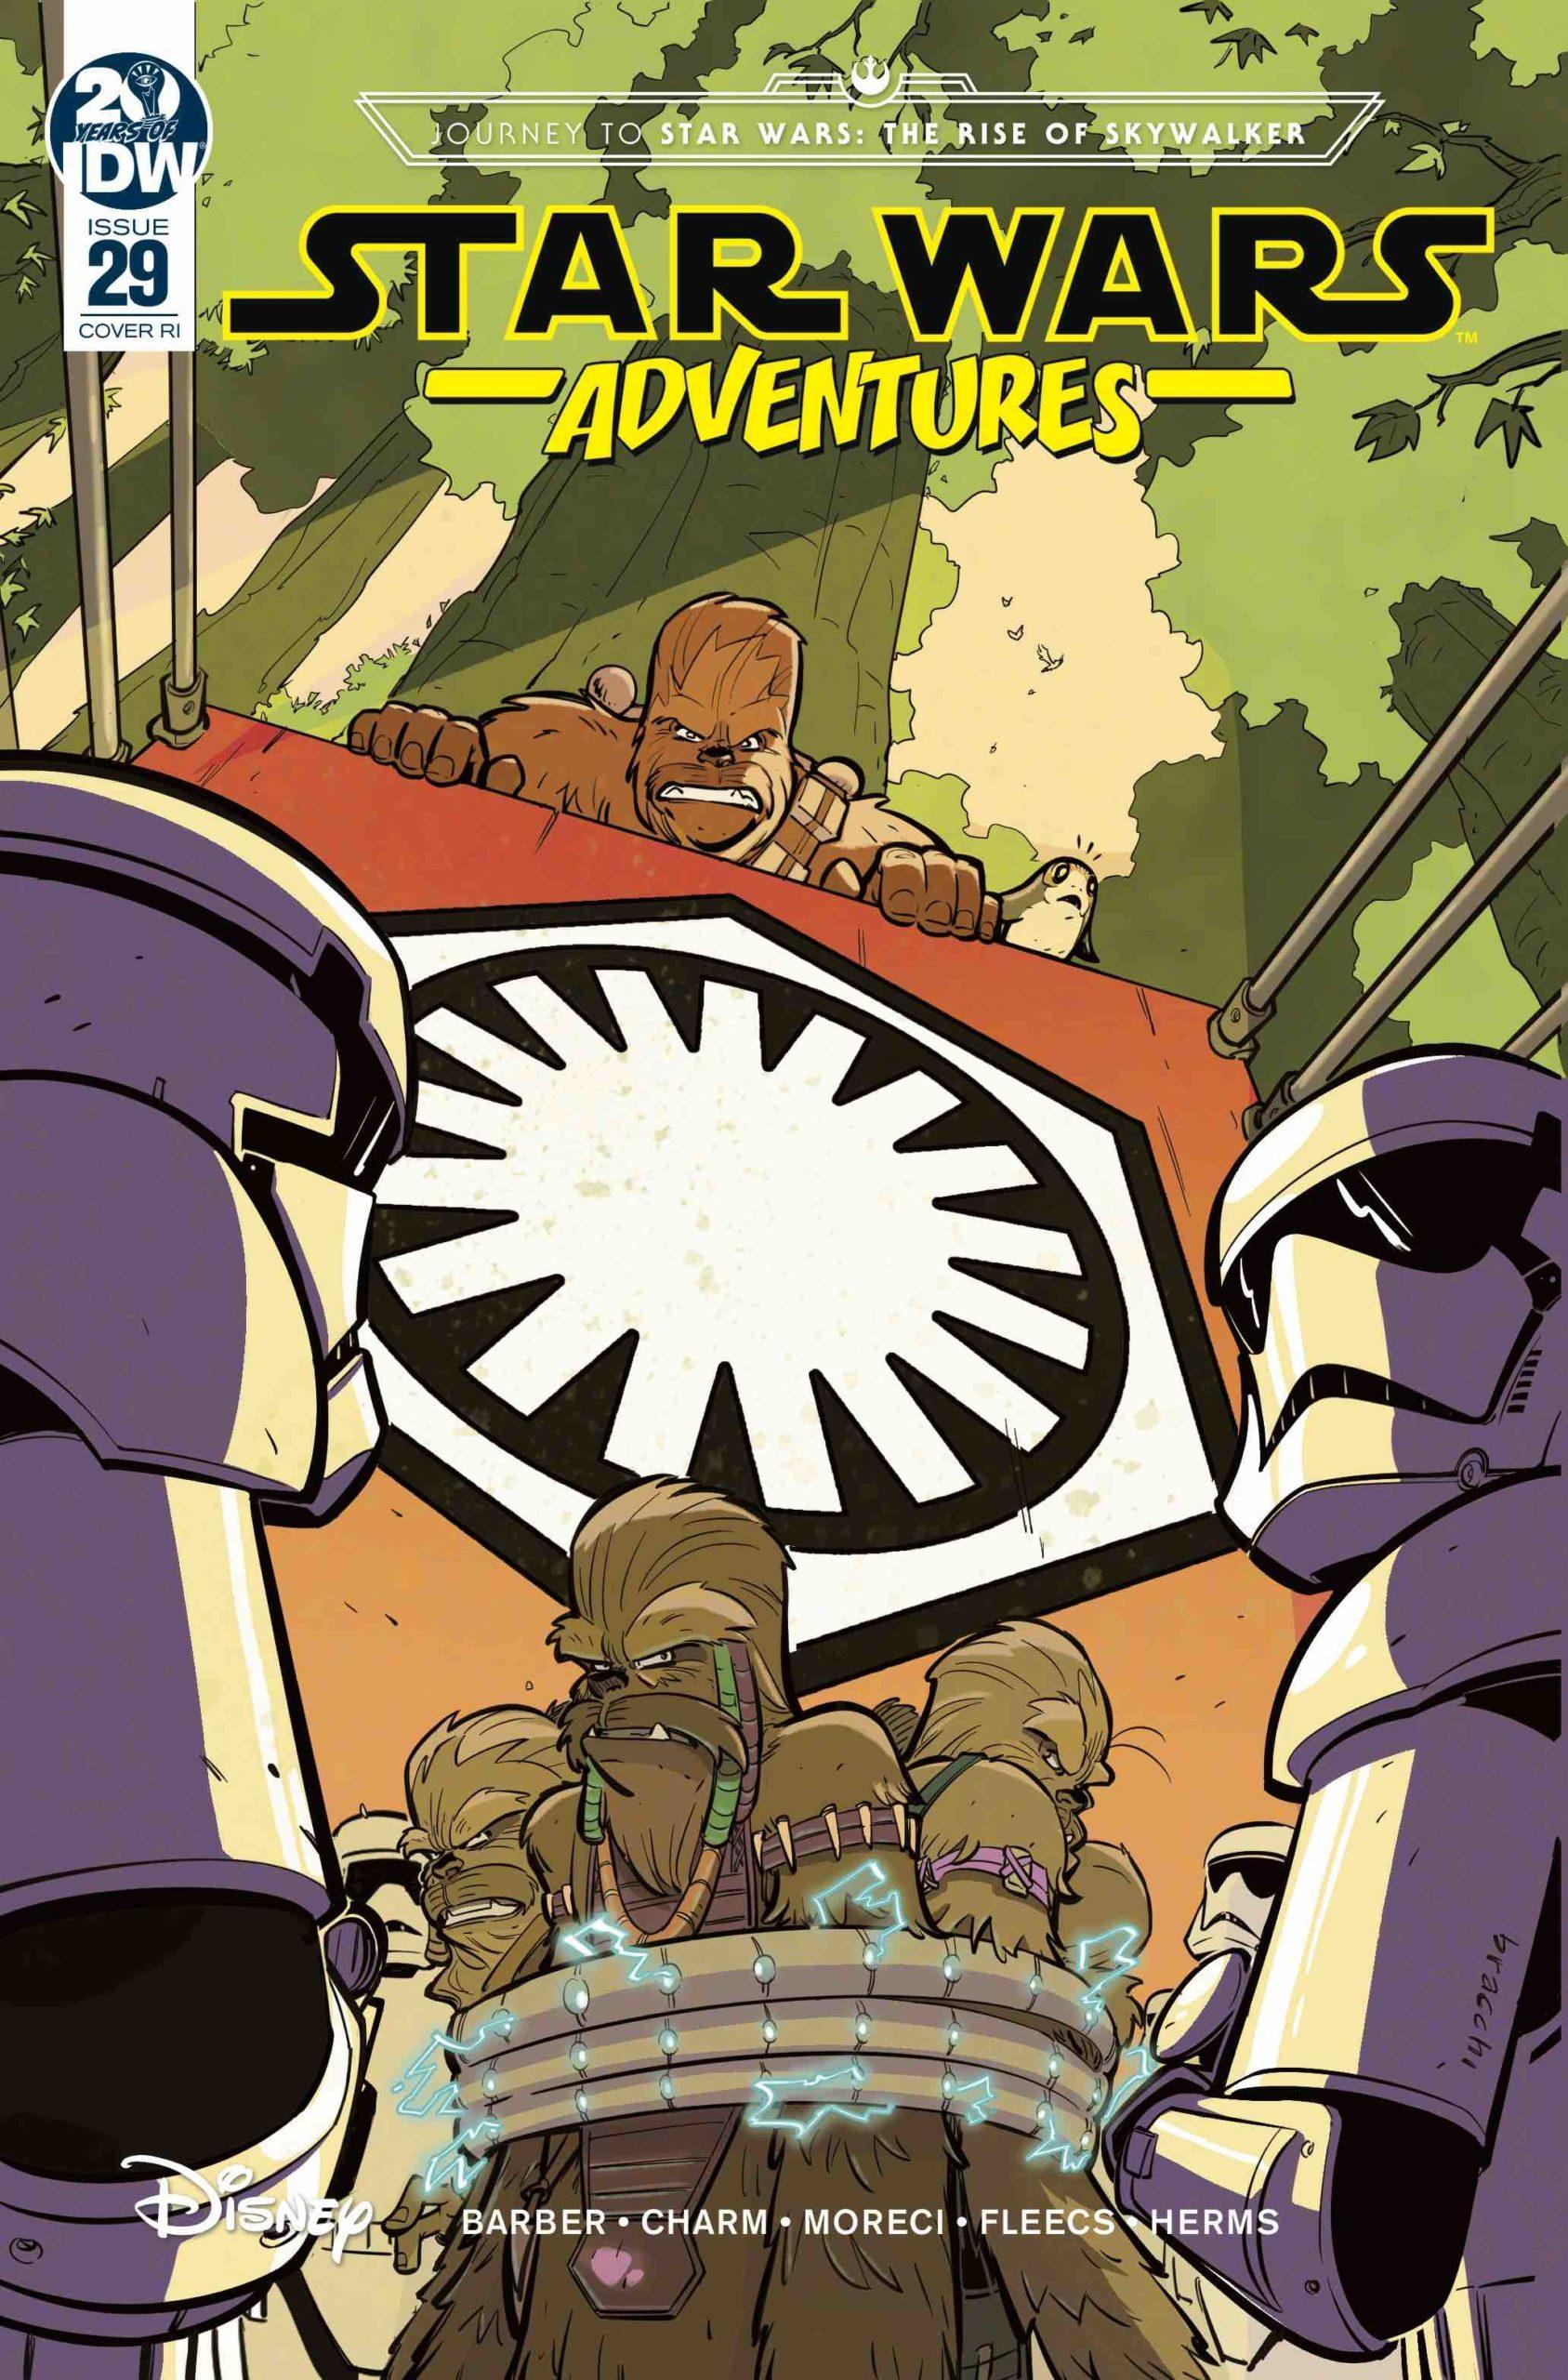 Star Wars Adventures #29 (Manuel Bracchi Variant Cover) (18.12.2019)